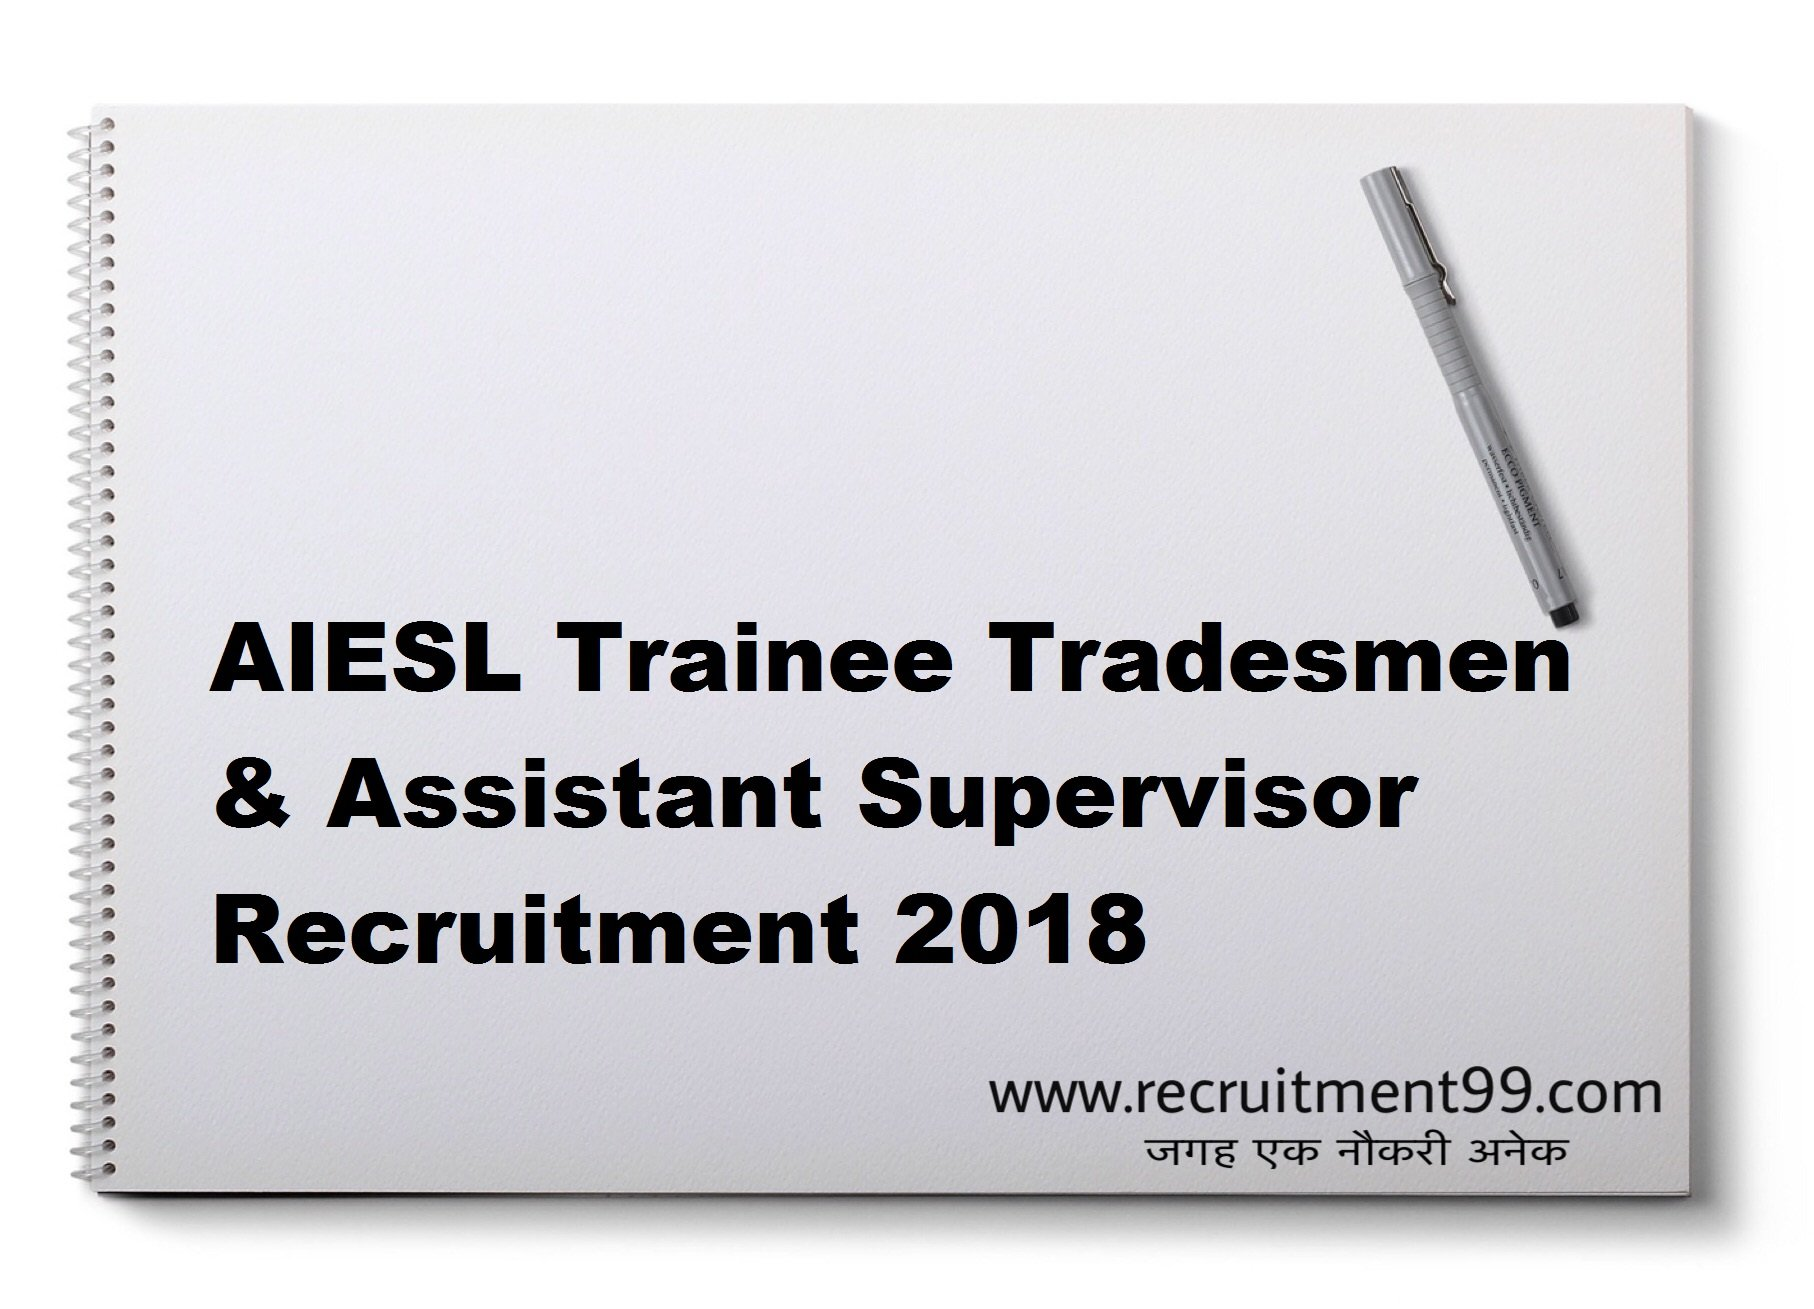 AIESL Trainee Tradesmen & Assistant Supervisor Recruitment Admit Card Result 2018